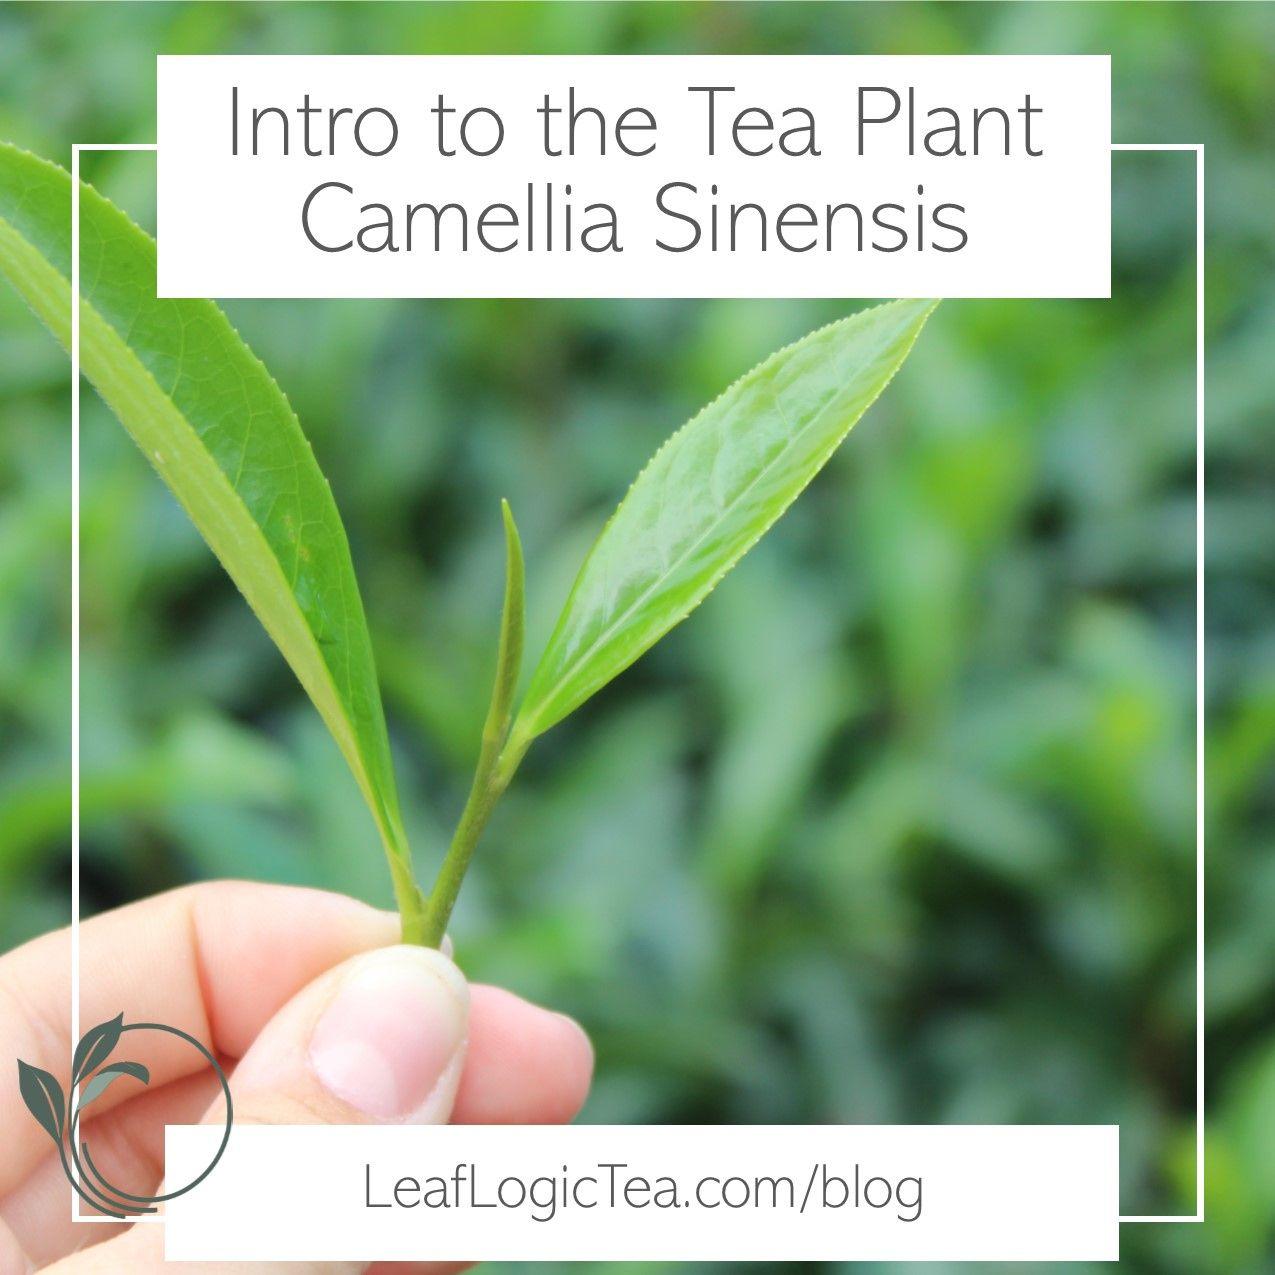 Introduction To The Tea Plant Camellia Sinensis Leaf Logic Wellness Tea Green Tea Plant Tea Plant Plants